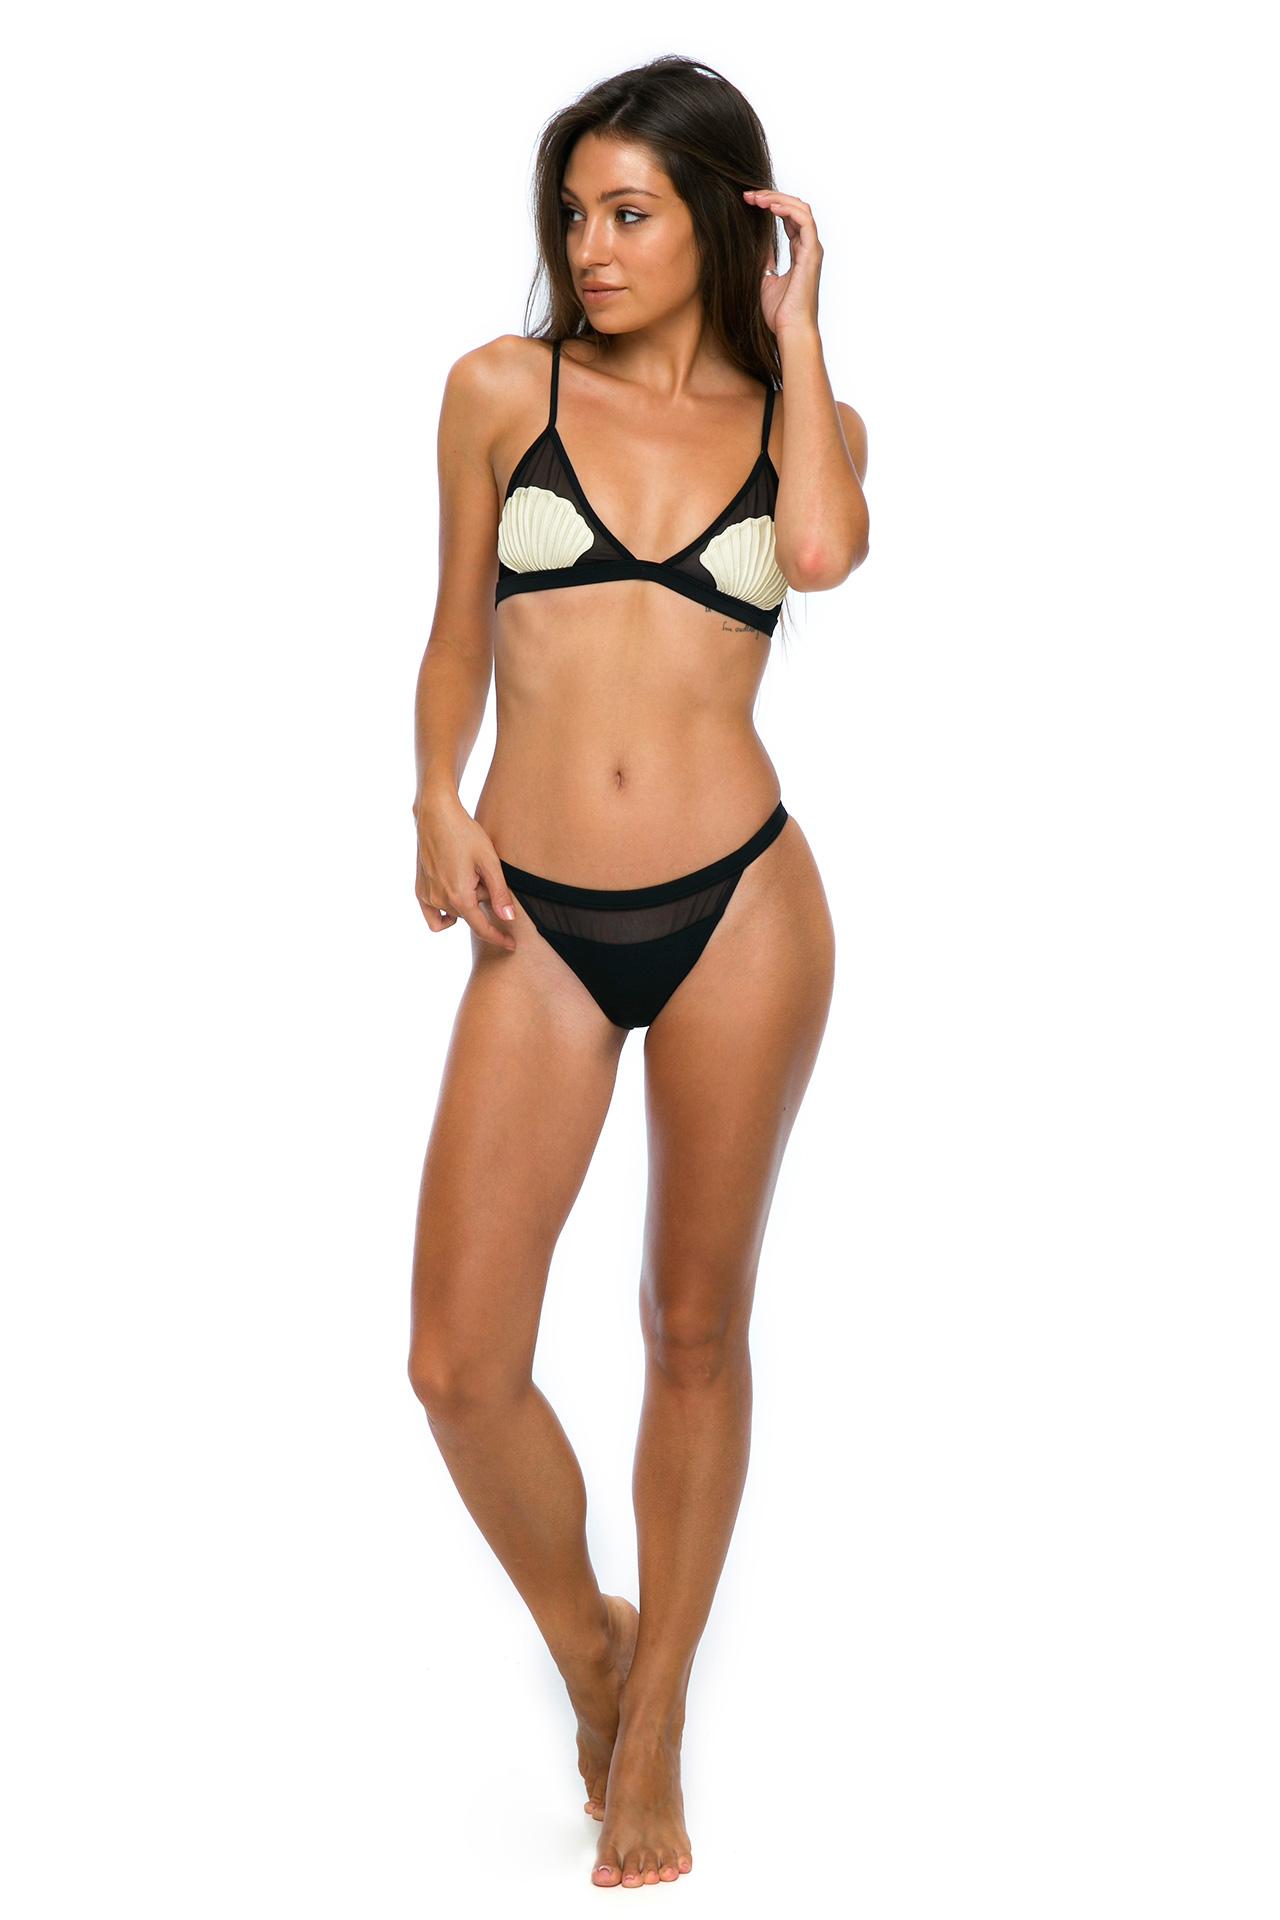 kerang-bikini-black-mesh-01